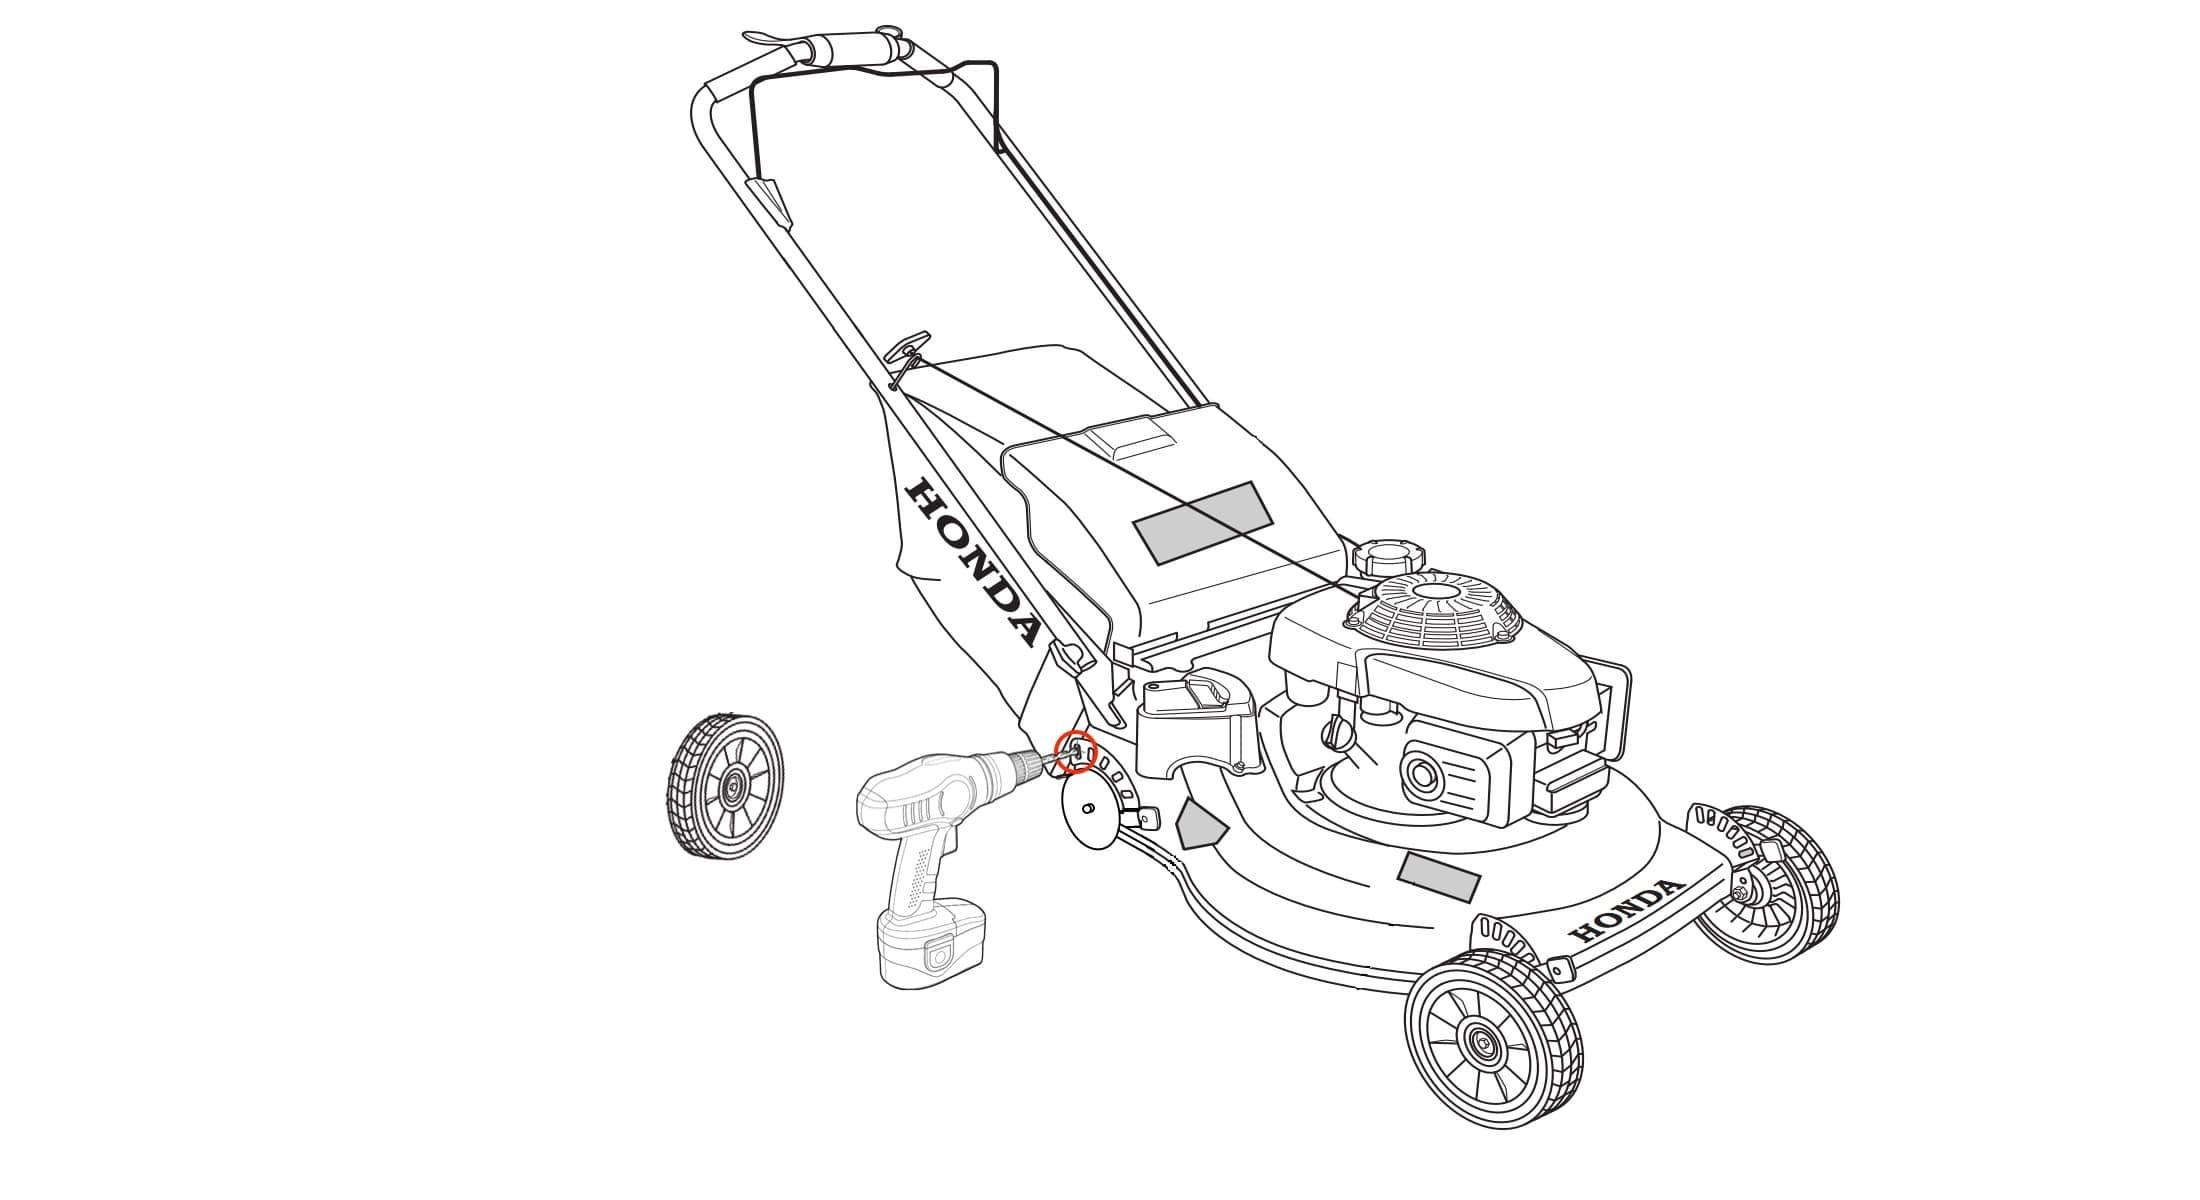 Honda Hrr216vka Parts Diagram Checkmate™ Lawn Striper for Honda Hrr216vka Of Honda Hrr216vka Parts Diagram